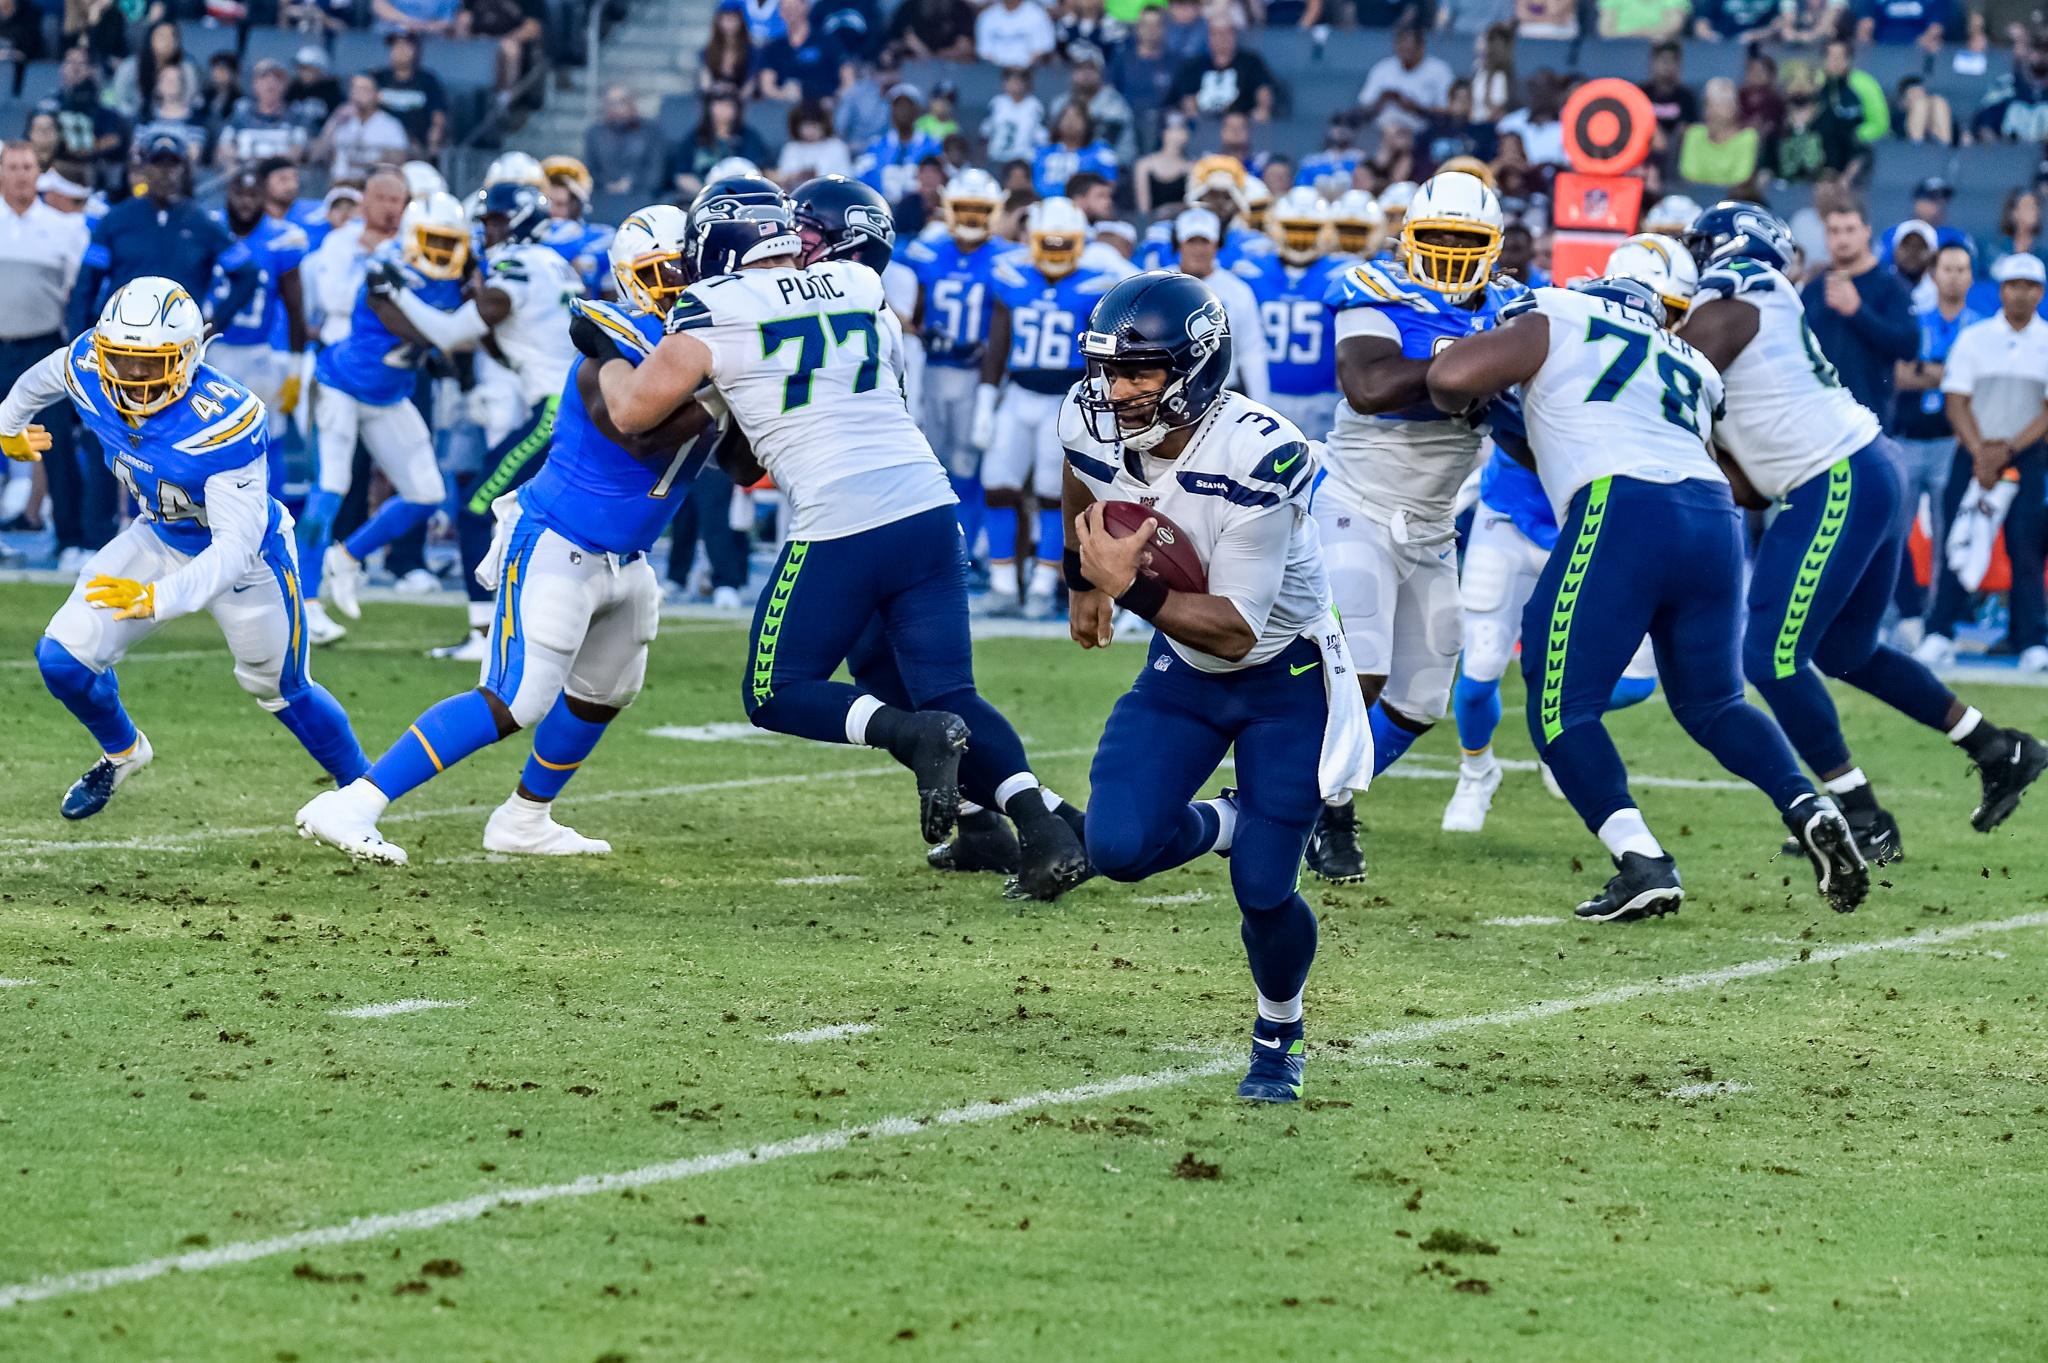 © Mark Hammond/News4usonline - Aug. 24, 2019 - Seahawks vs. Chargers - Seattle Seahawks quarterback Russell Wilson on the run